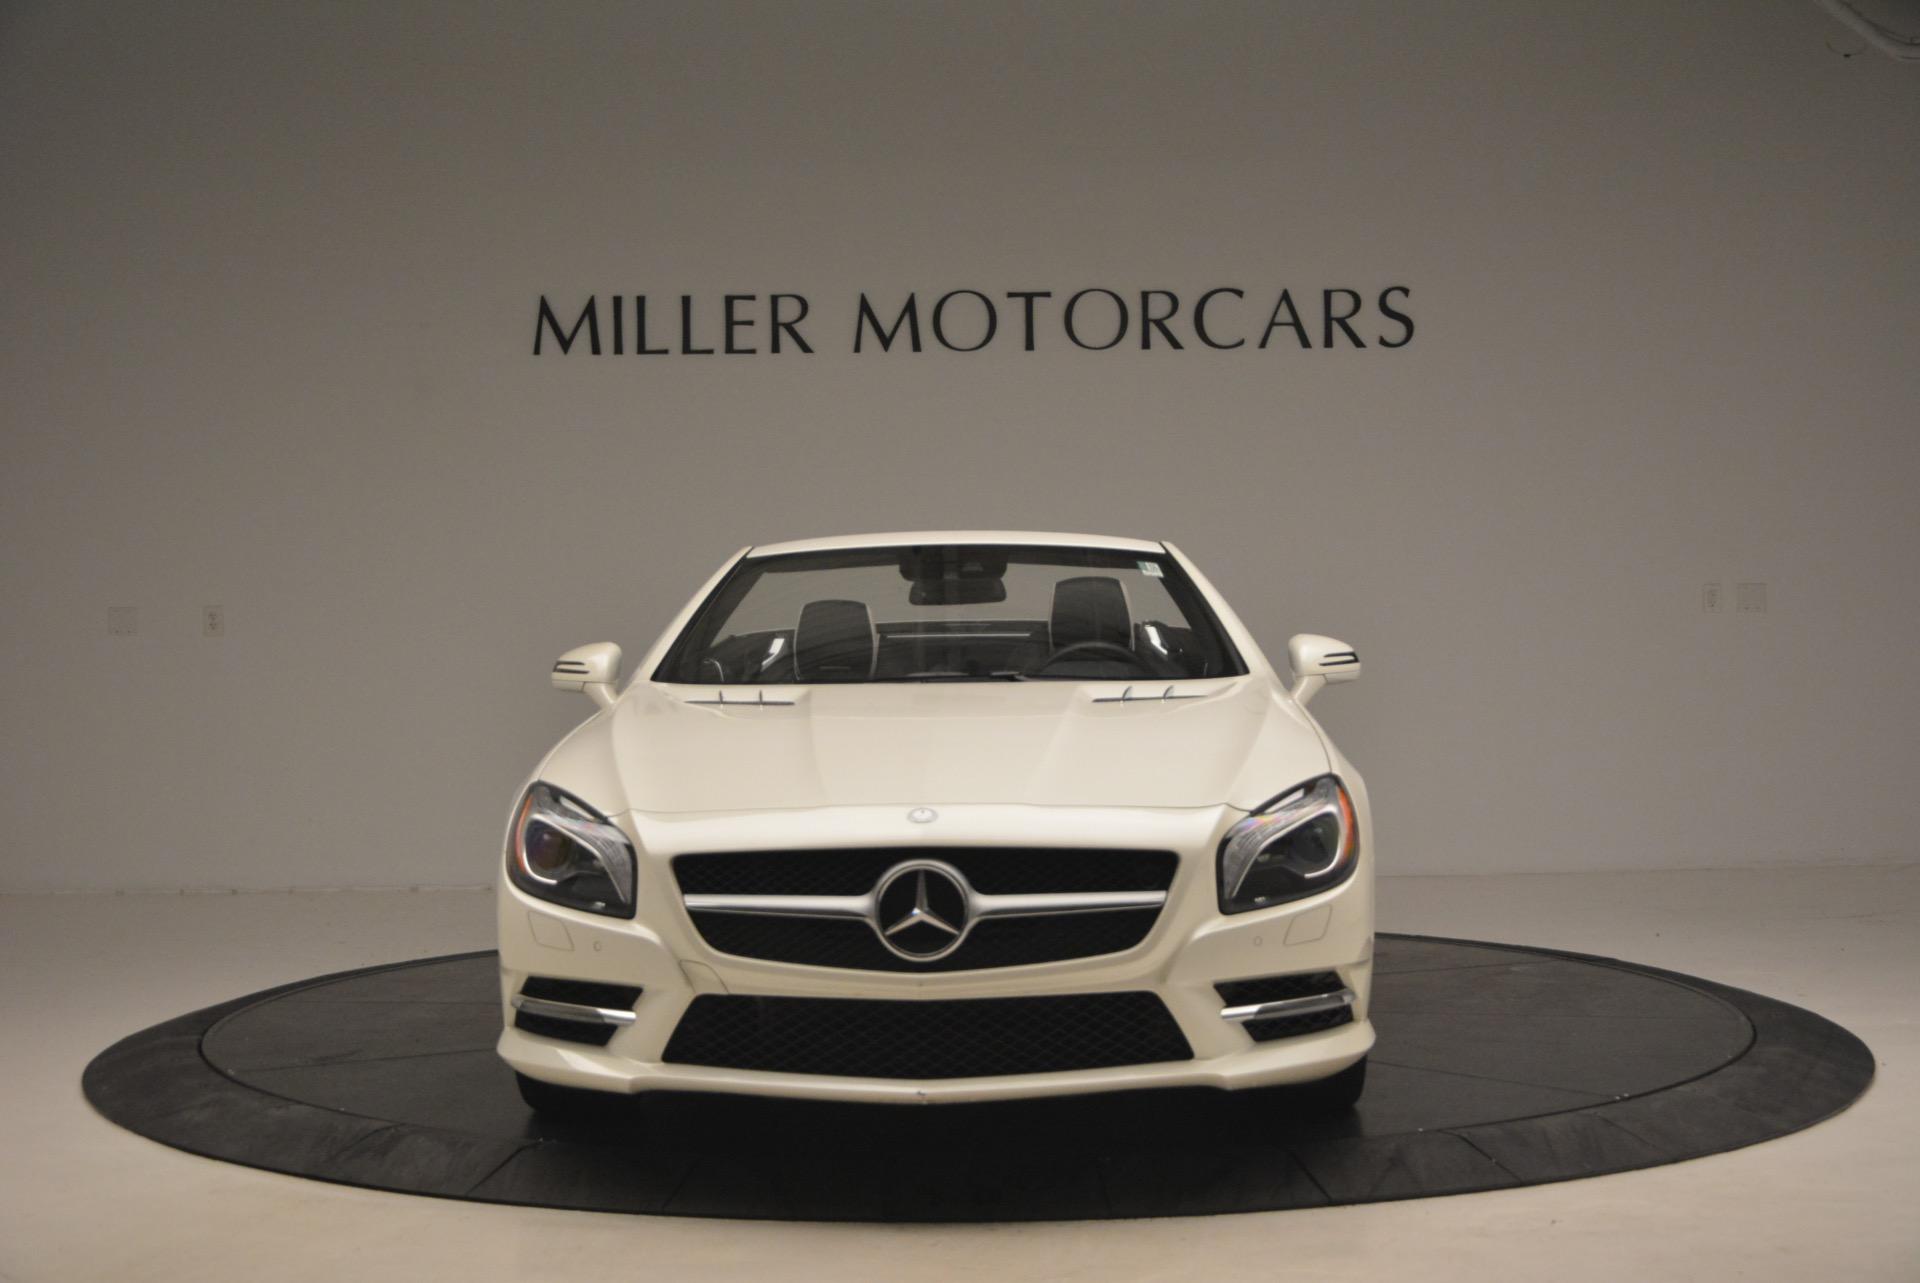 Used 2015 Mercedes Benz SL-Class SL 550 For Sale In Greenwich, CT. Alfa Romeo of Greenwich, M1874A 1261_p13